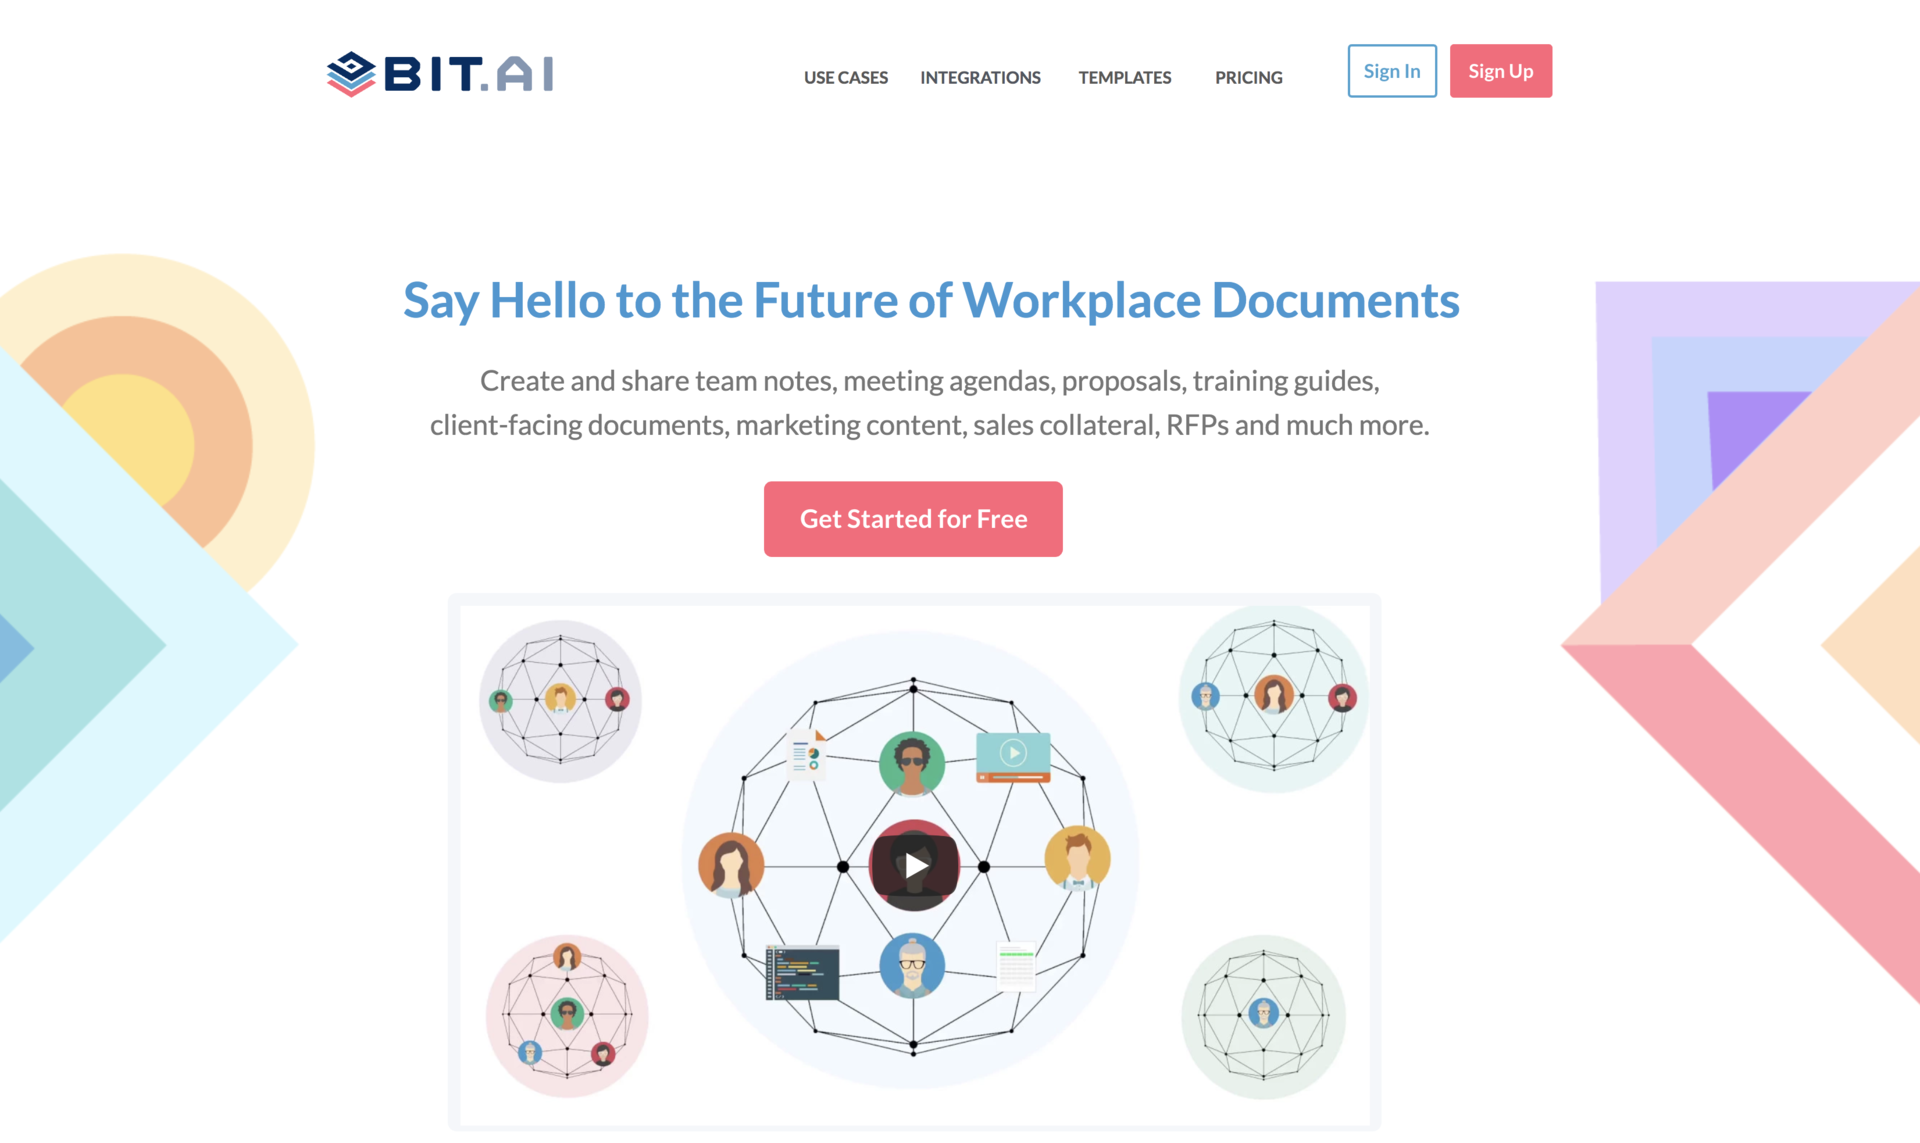 Bit.ai for blogging